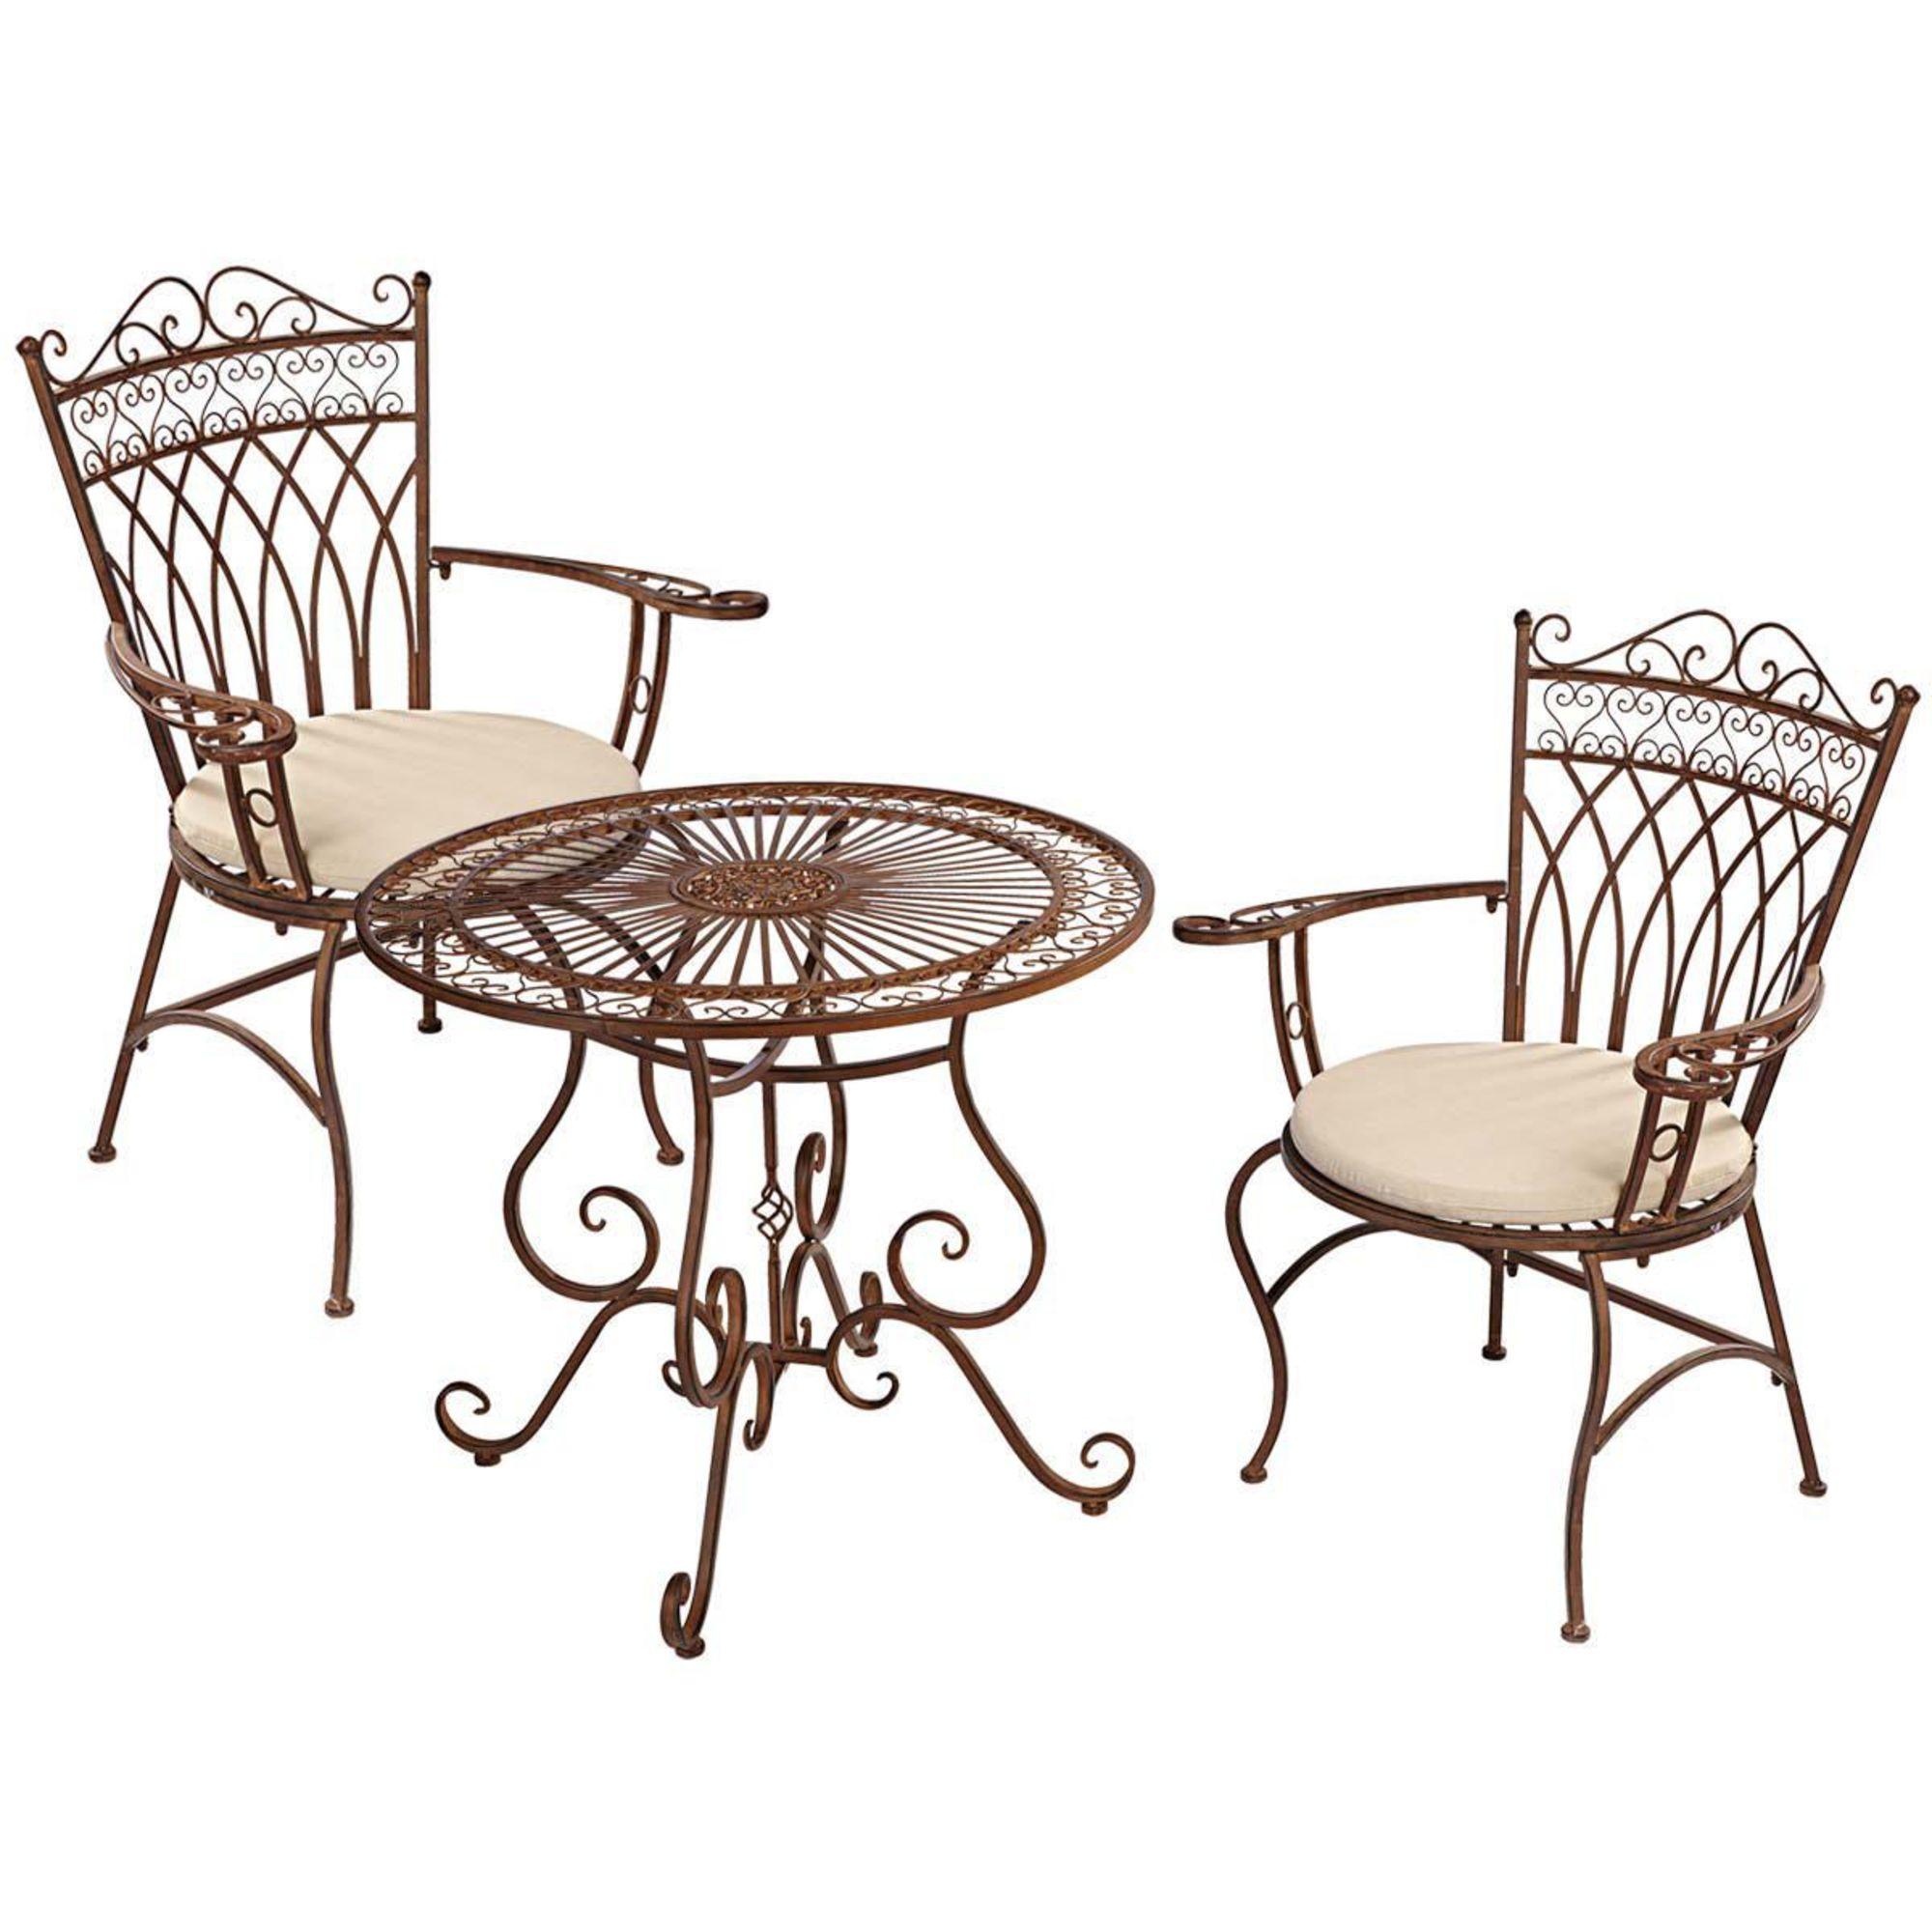 Gartenmöbel-Set, 3-tlg. Versailles